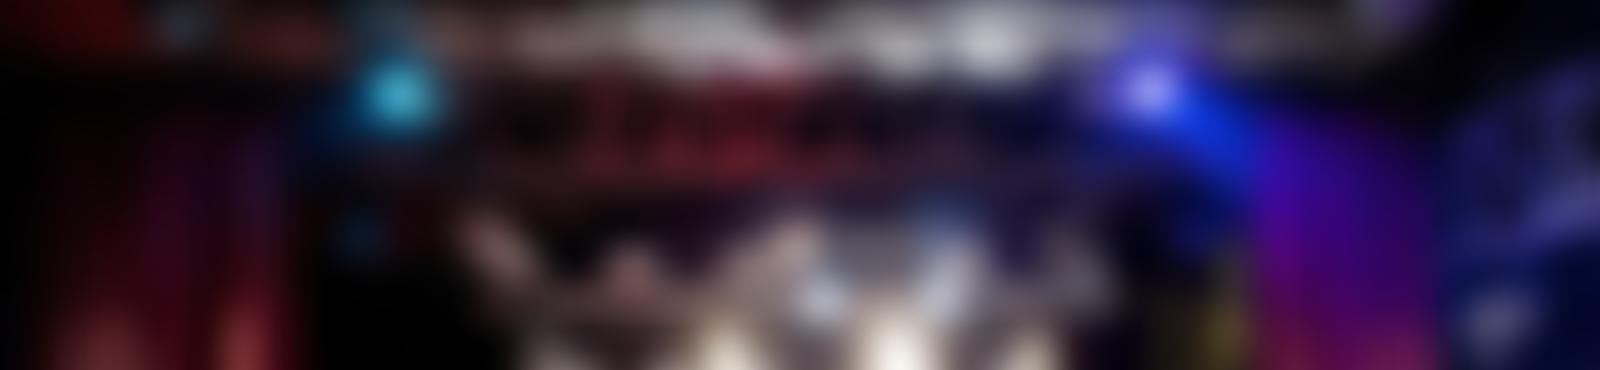 Blurred 4d683eea 69c4 4fcb 882c 2cf00e0dd344